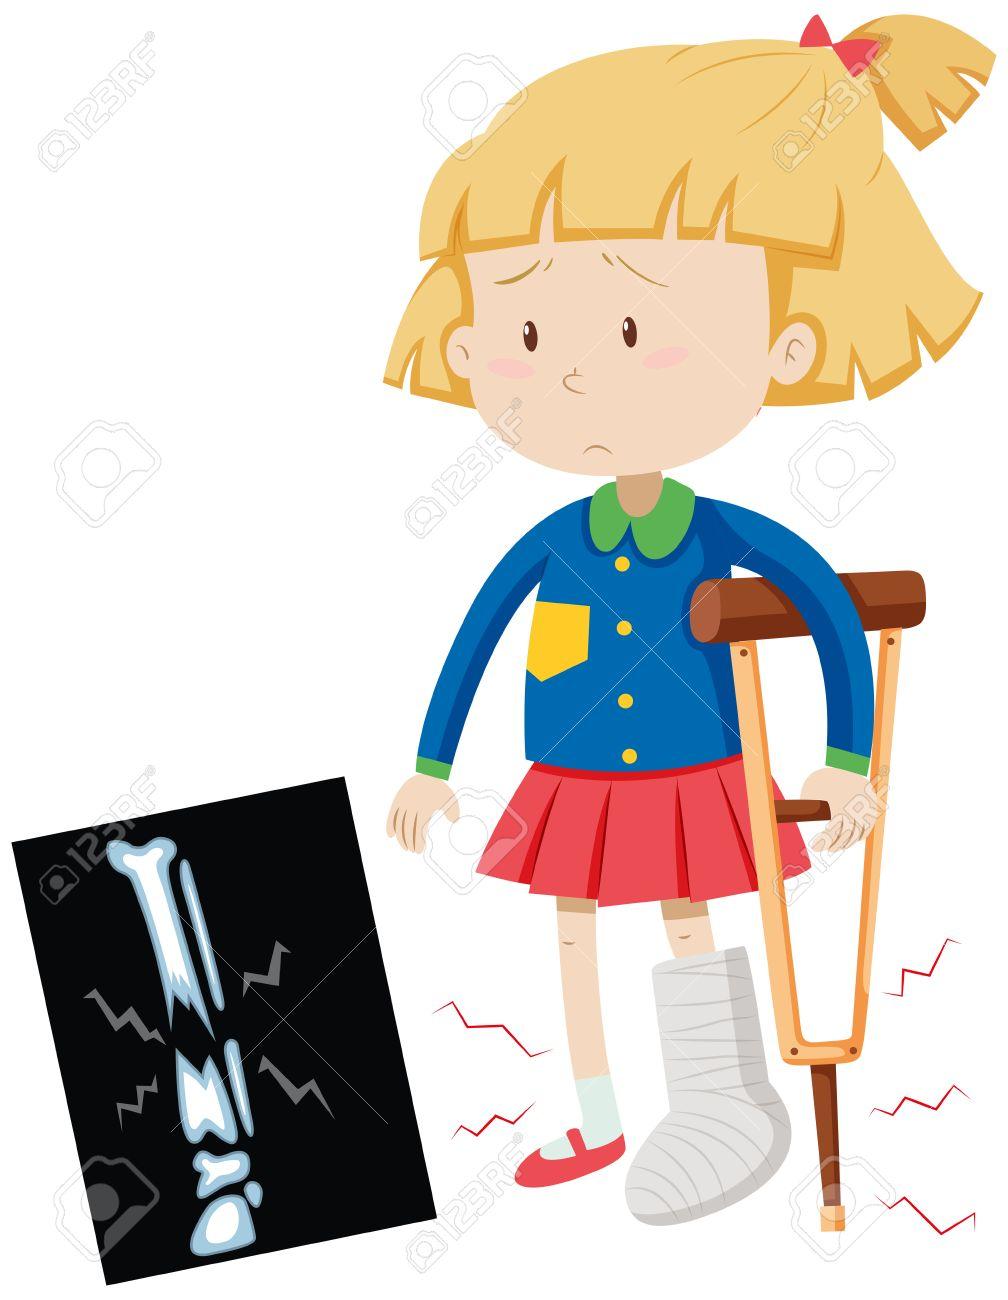 little girl with broken leg illustration royalty free cliparts rh 123rf com broken ankle clipart broken leg clipart images